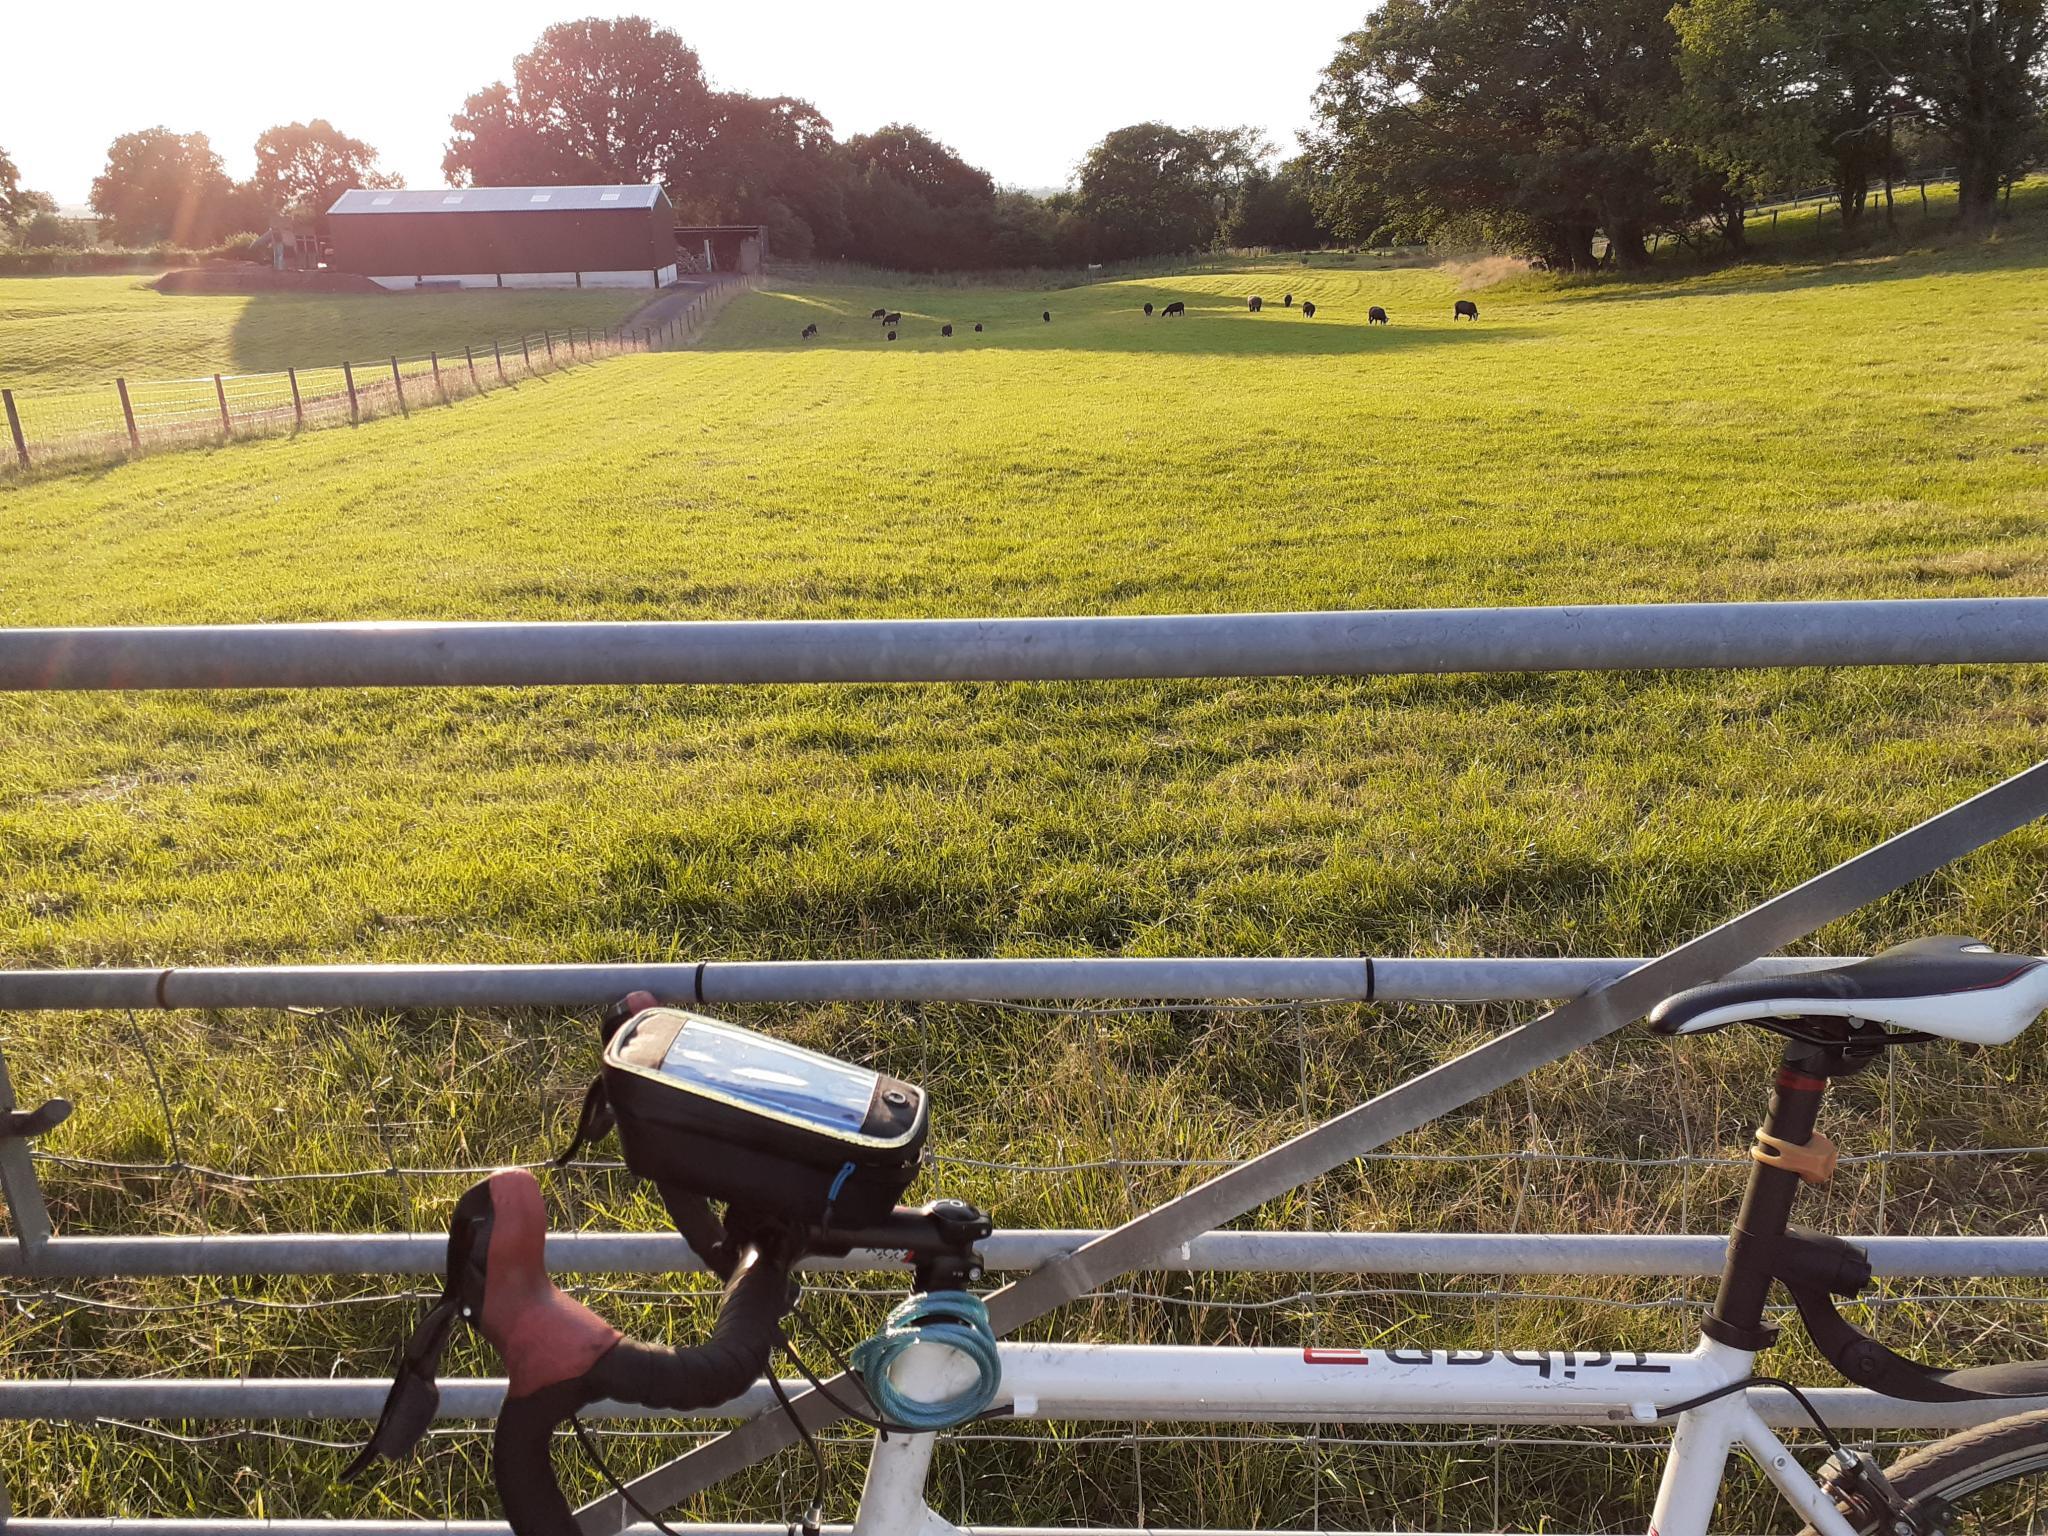 On my bike-20210802_195638-jpg